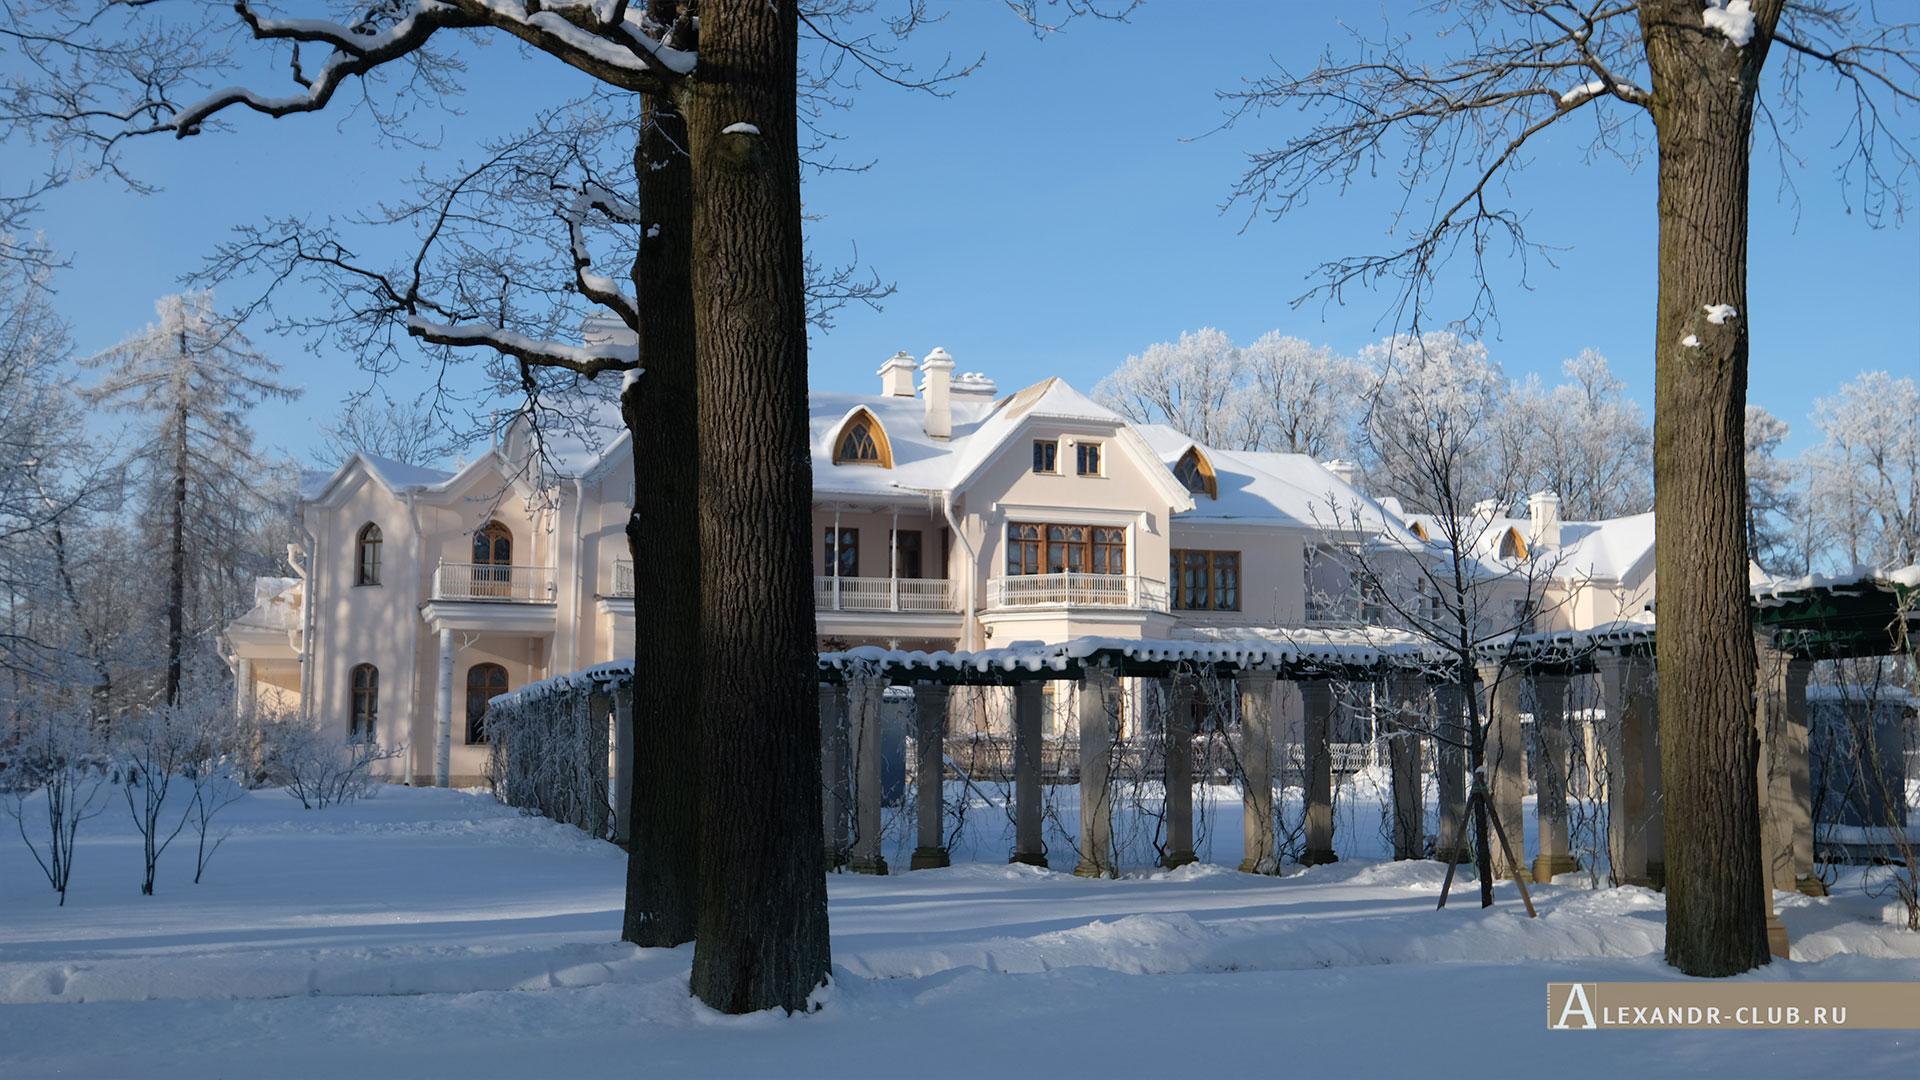 Петергоф, зима, парк «Александрия», Фермерский дворец